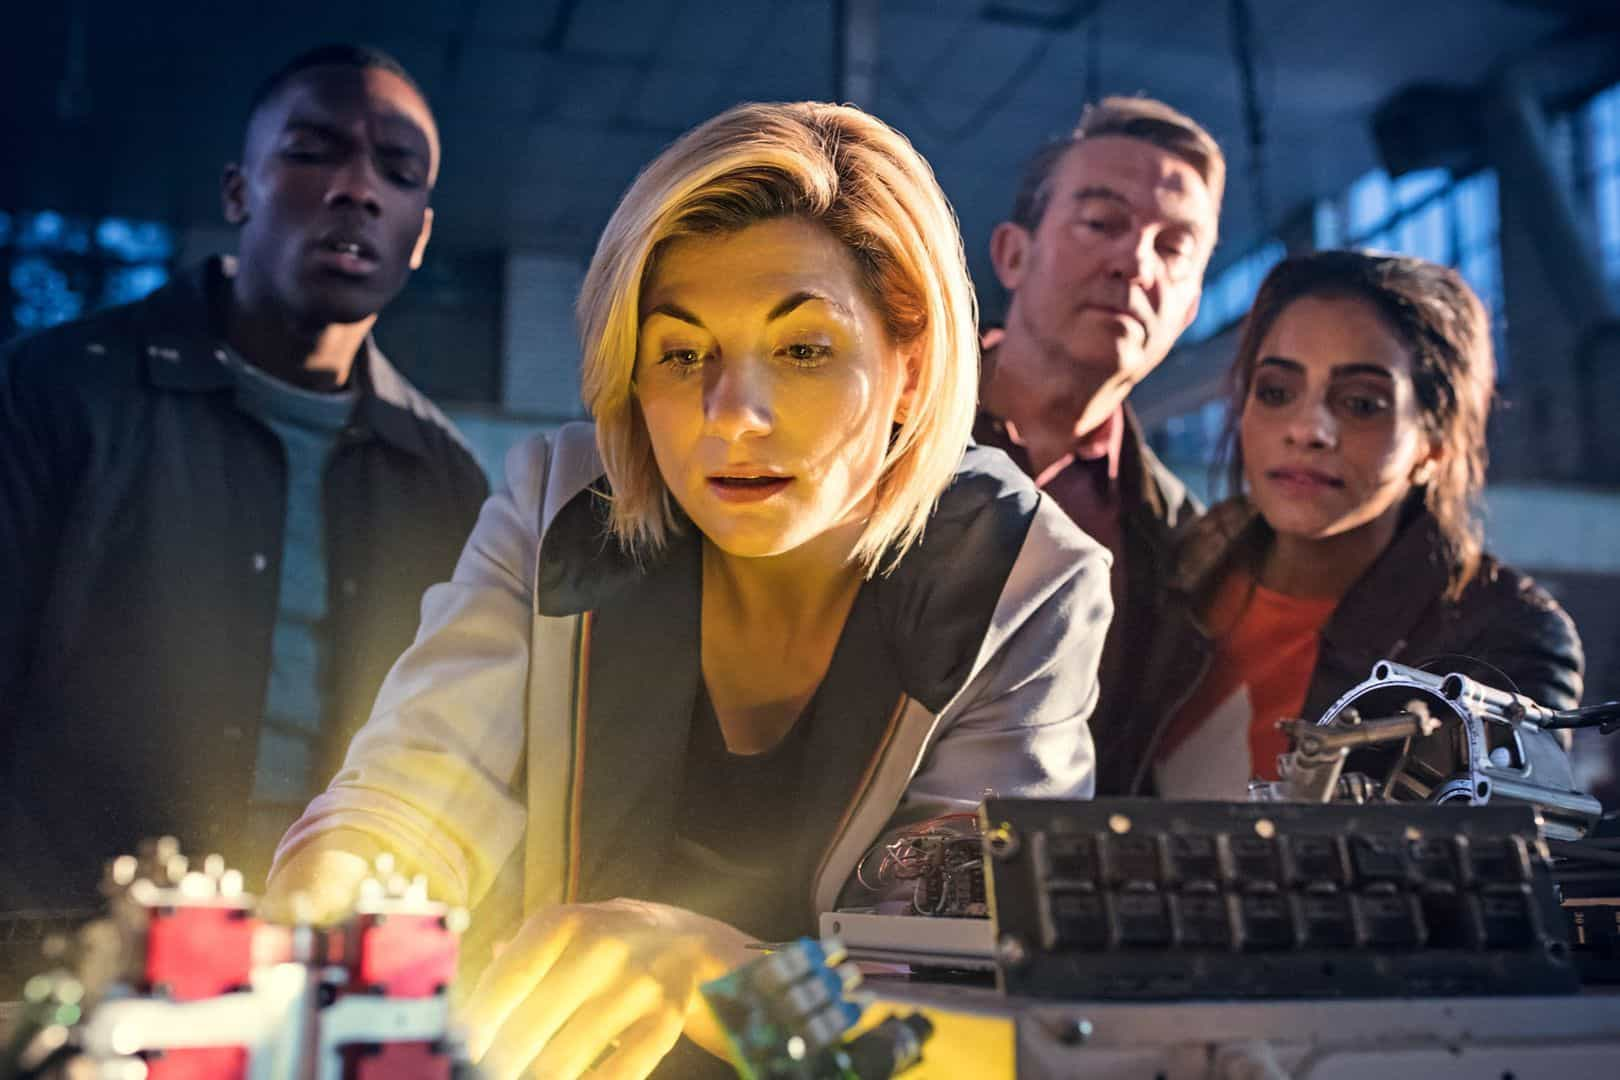 Por engano, Amazon disponibiliza ep. de 'Doctor Who' antes de estreia